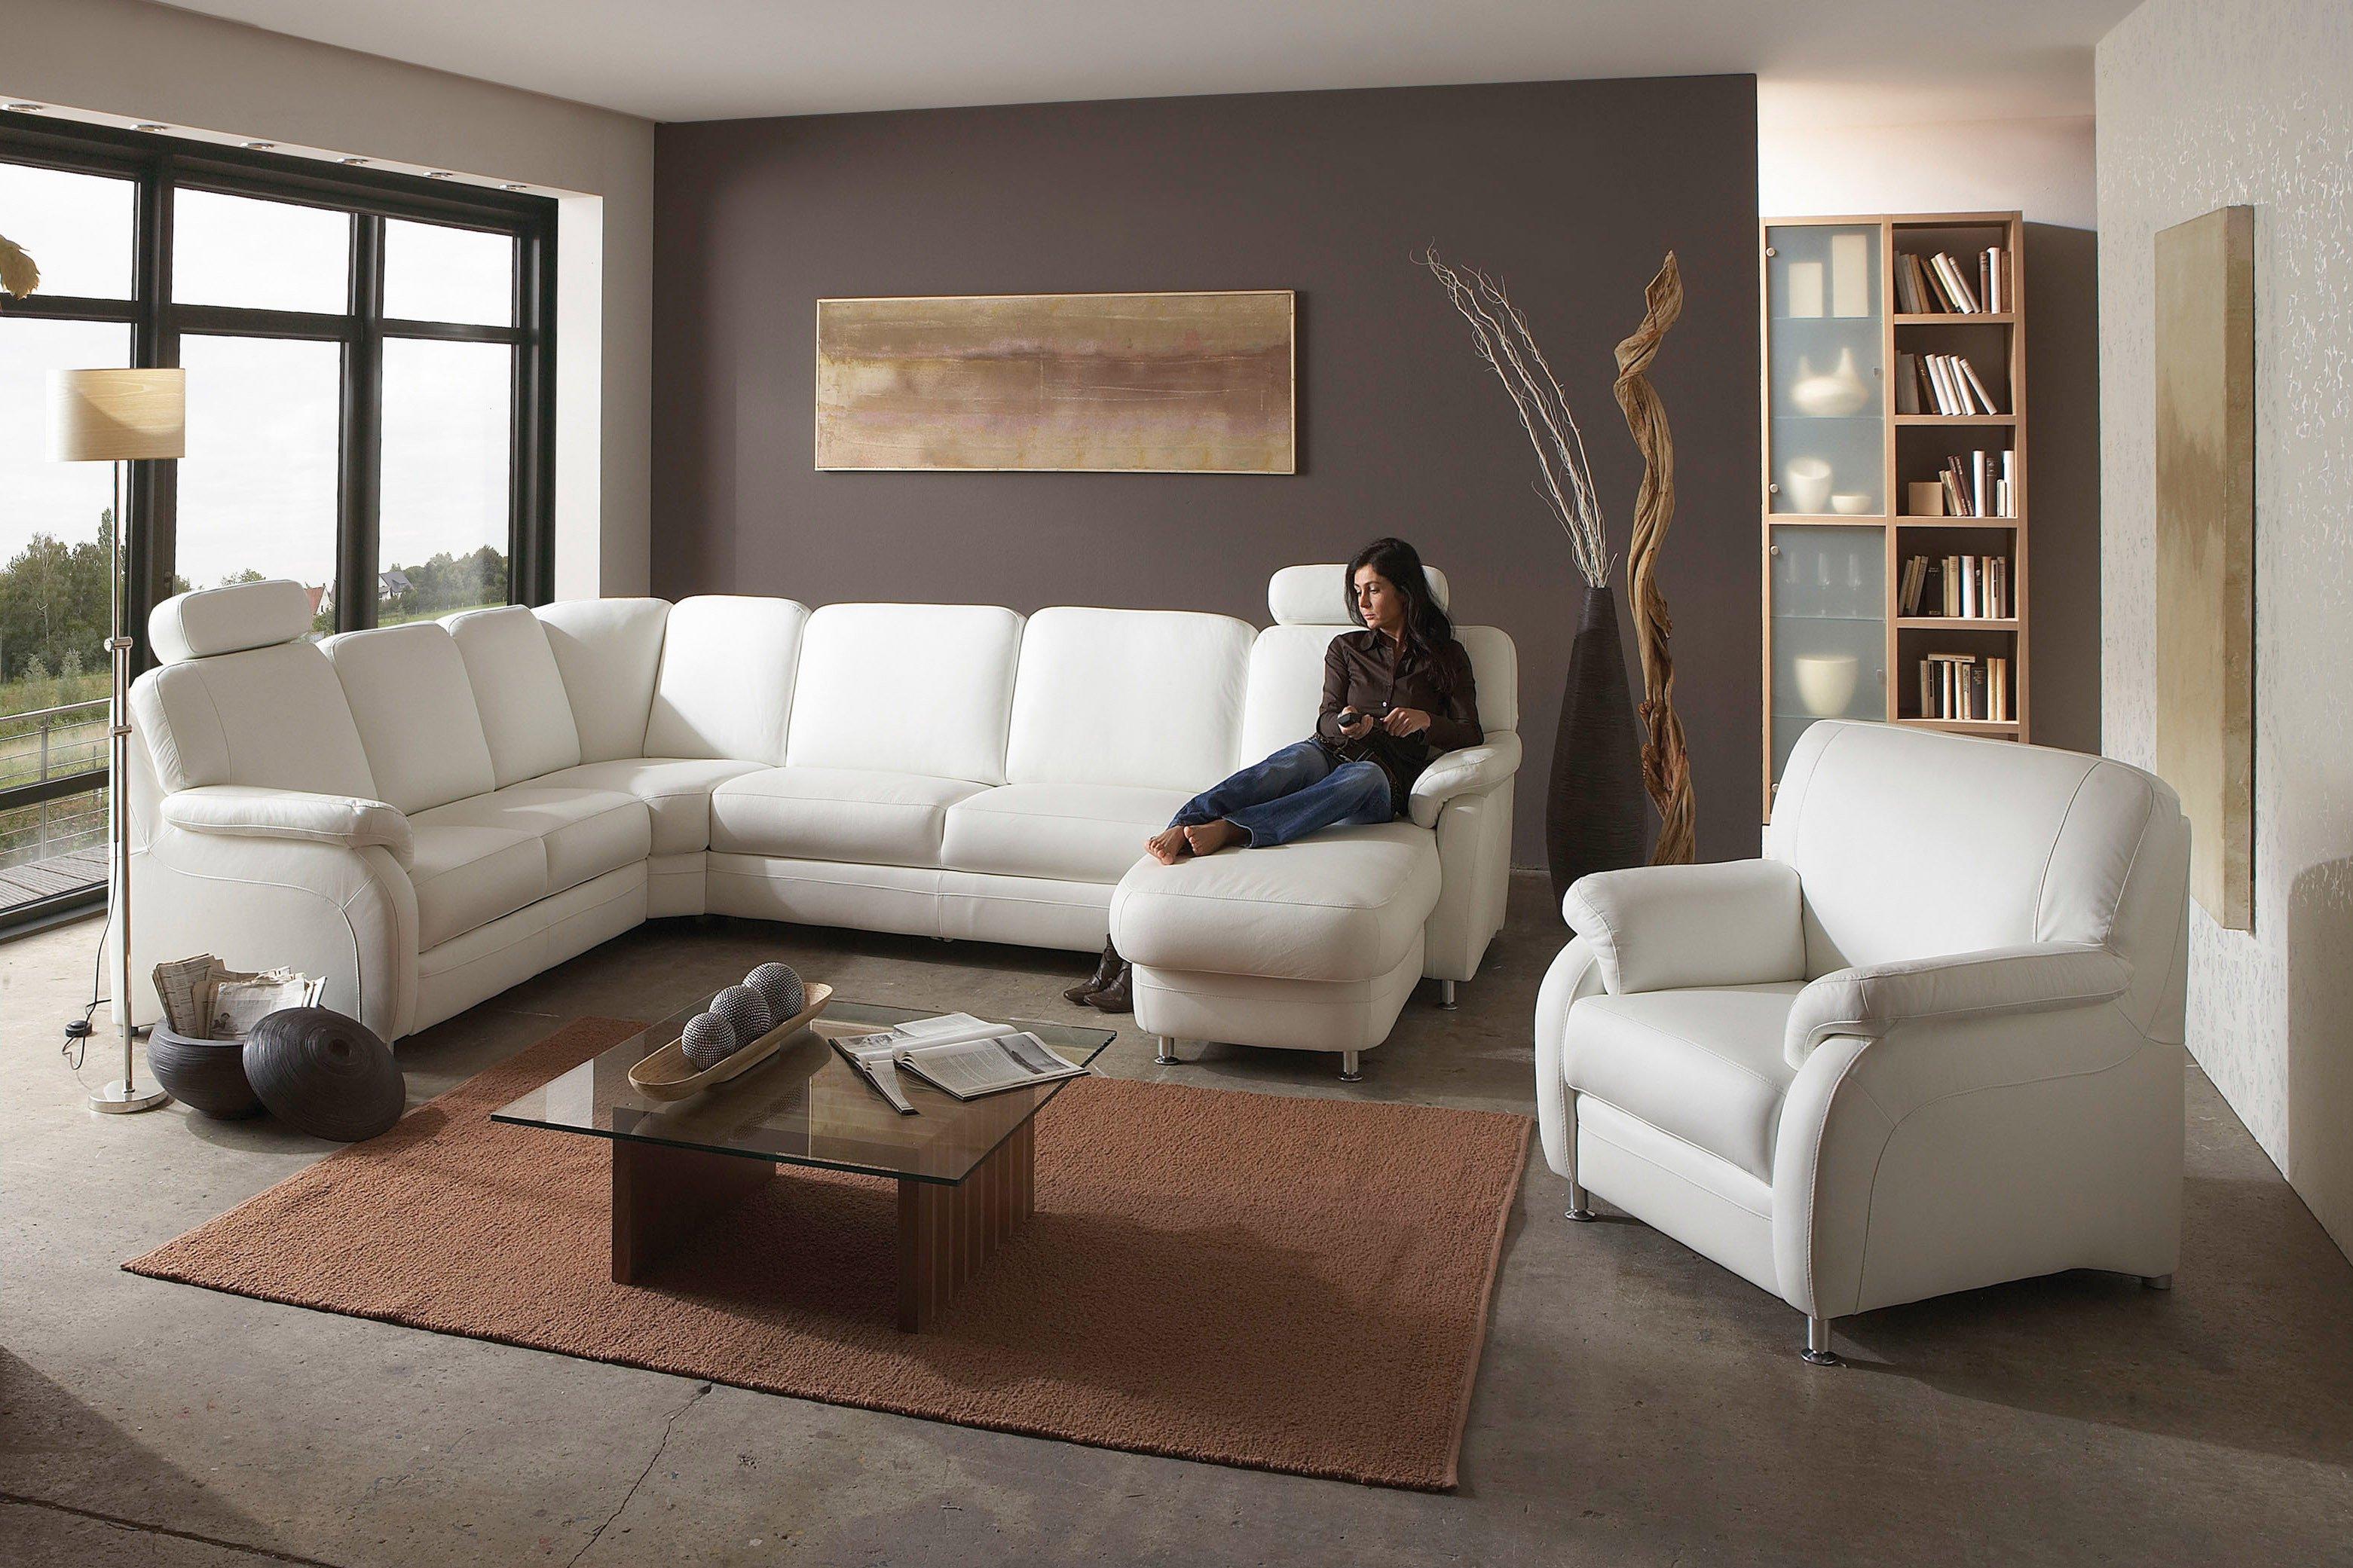 polinova polsterm bel tavira l polstergarnitur wei. Black Bedroom Furniture Sets. Home Design Ideas